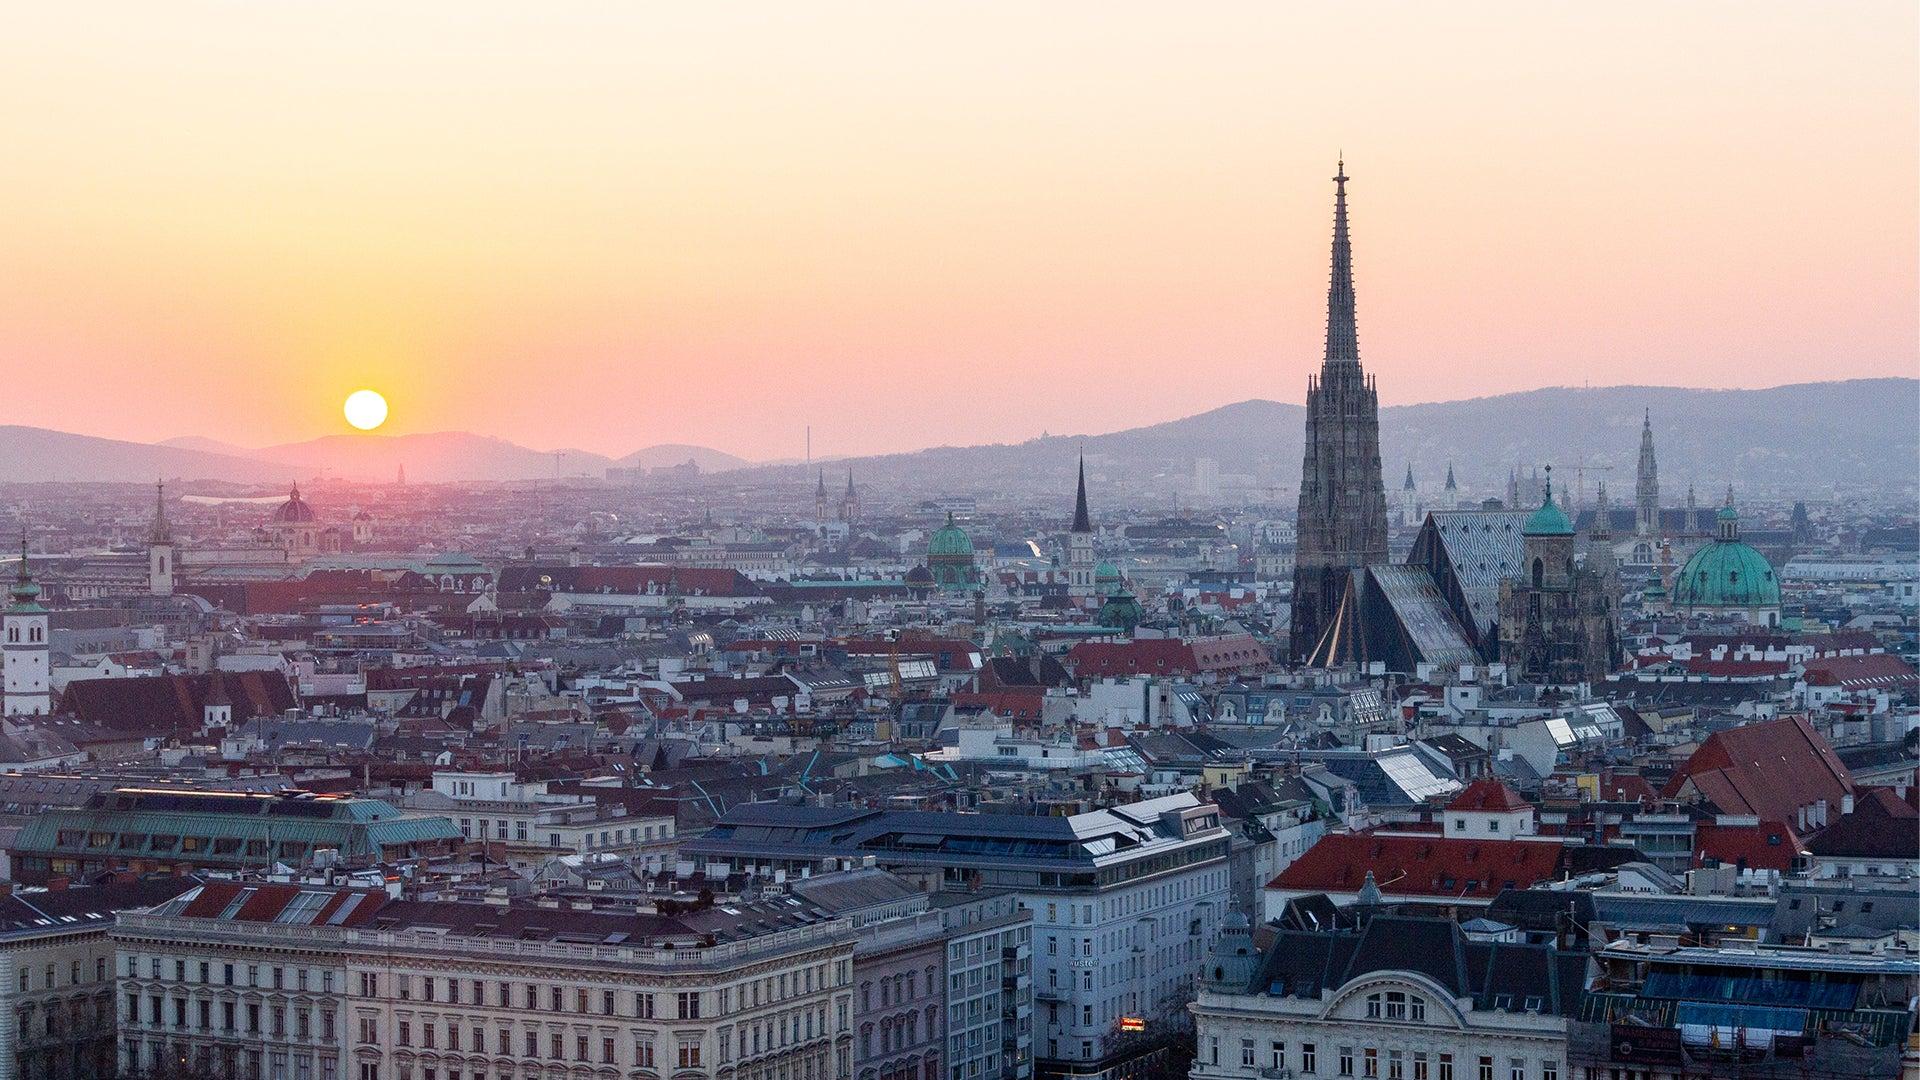 A skyline view of Vienna